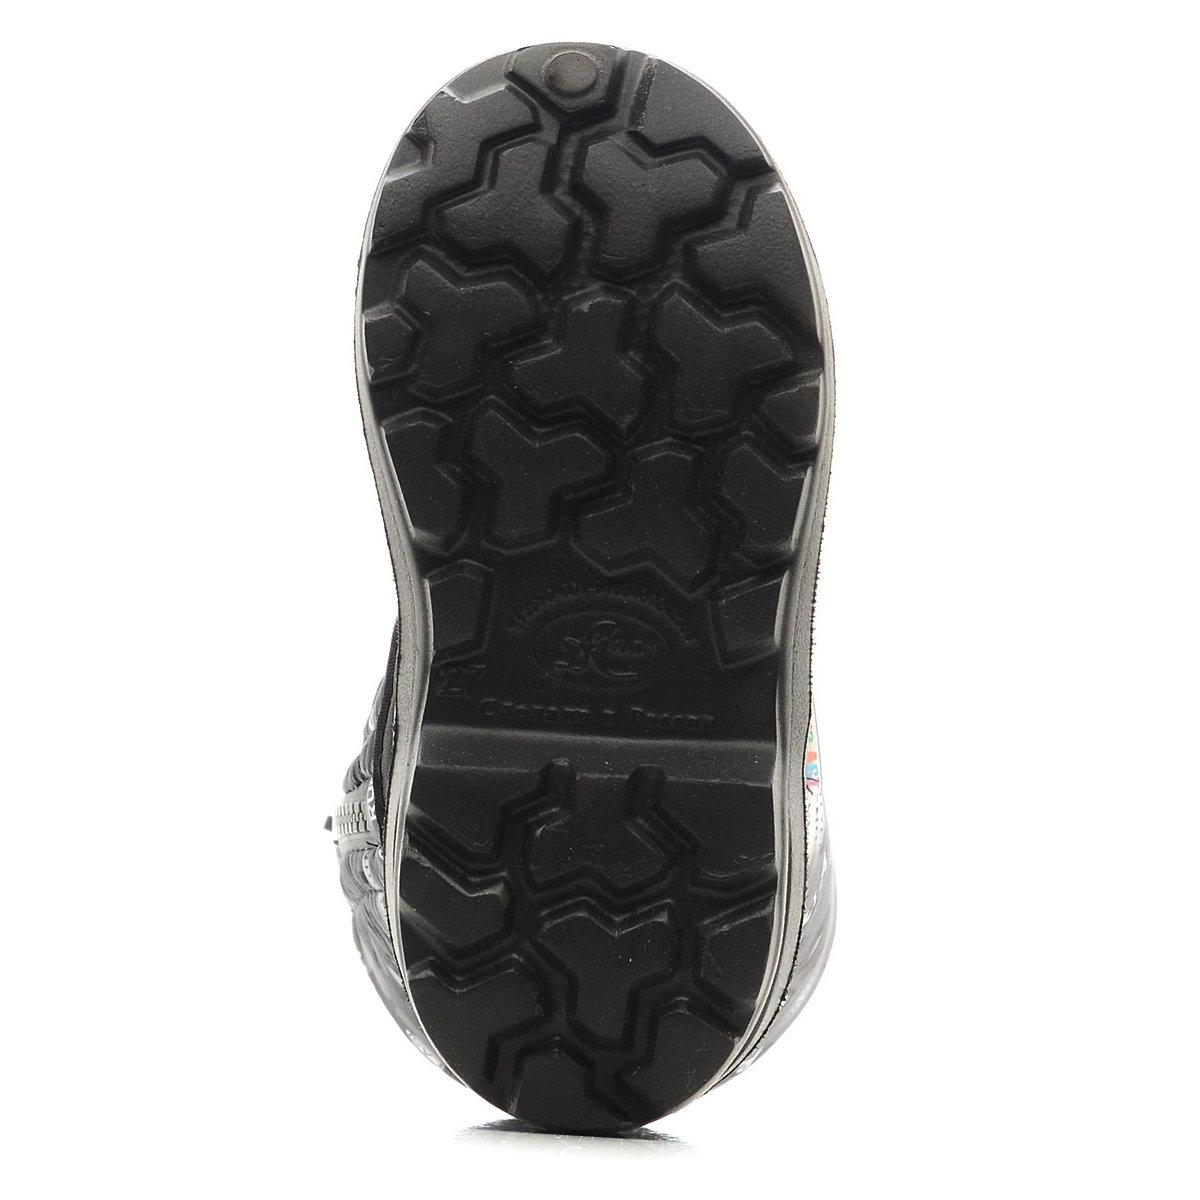 571/02-01 Сапоги Дюна Сноубутсы оптом, рок серый/т.серый, размеры 27-33